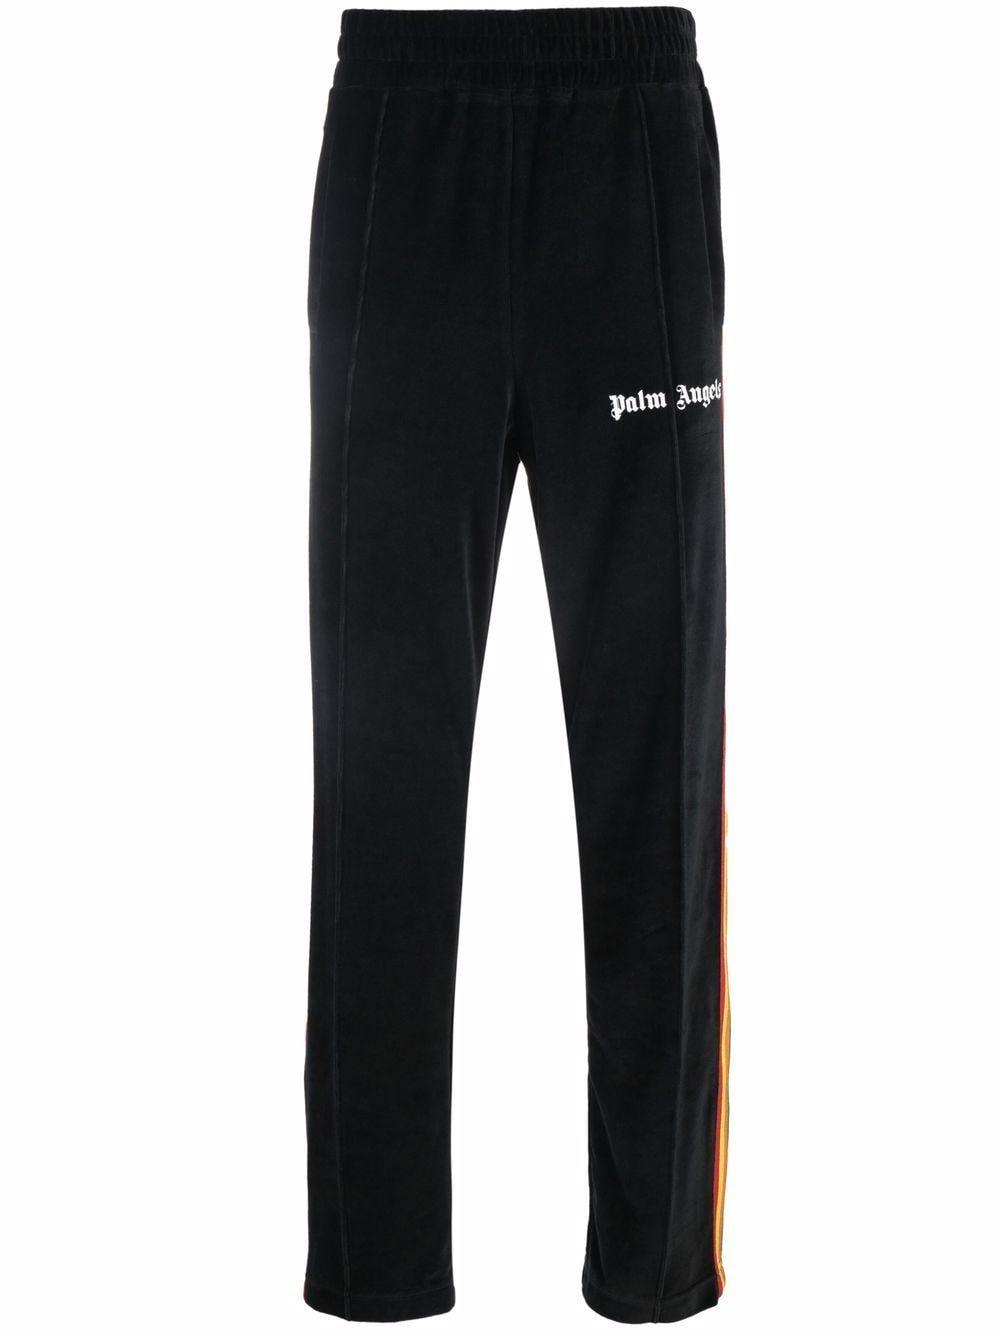 Pantalone track